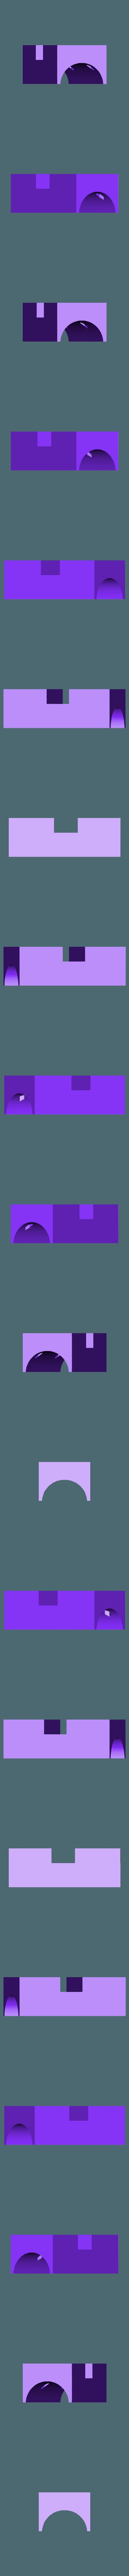 selector_v41_selector_v41_Component18_1_Body1_Component18.stl Télécharger fichier STL gratuit Plasma Cutter plotter CNC • Modèle à imprimer en 3D, TinkersProjects